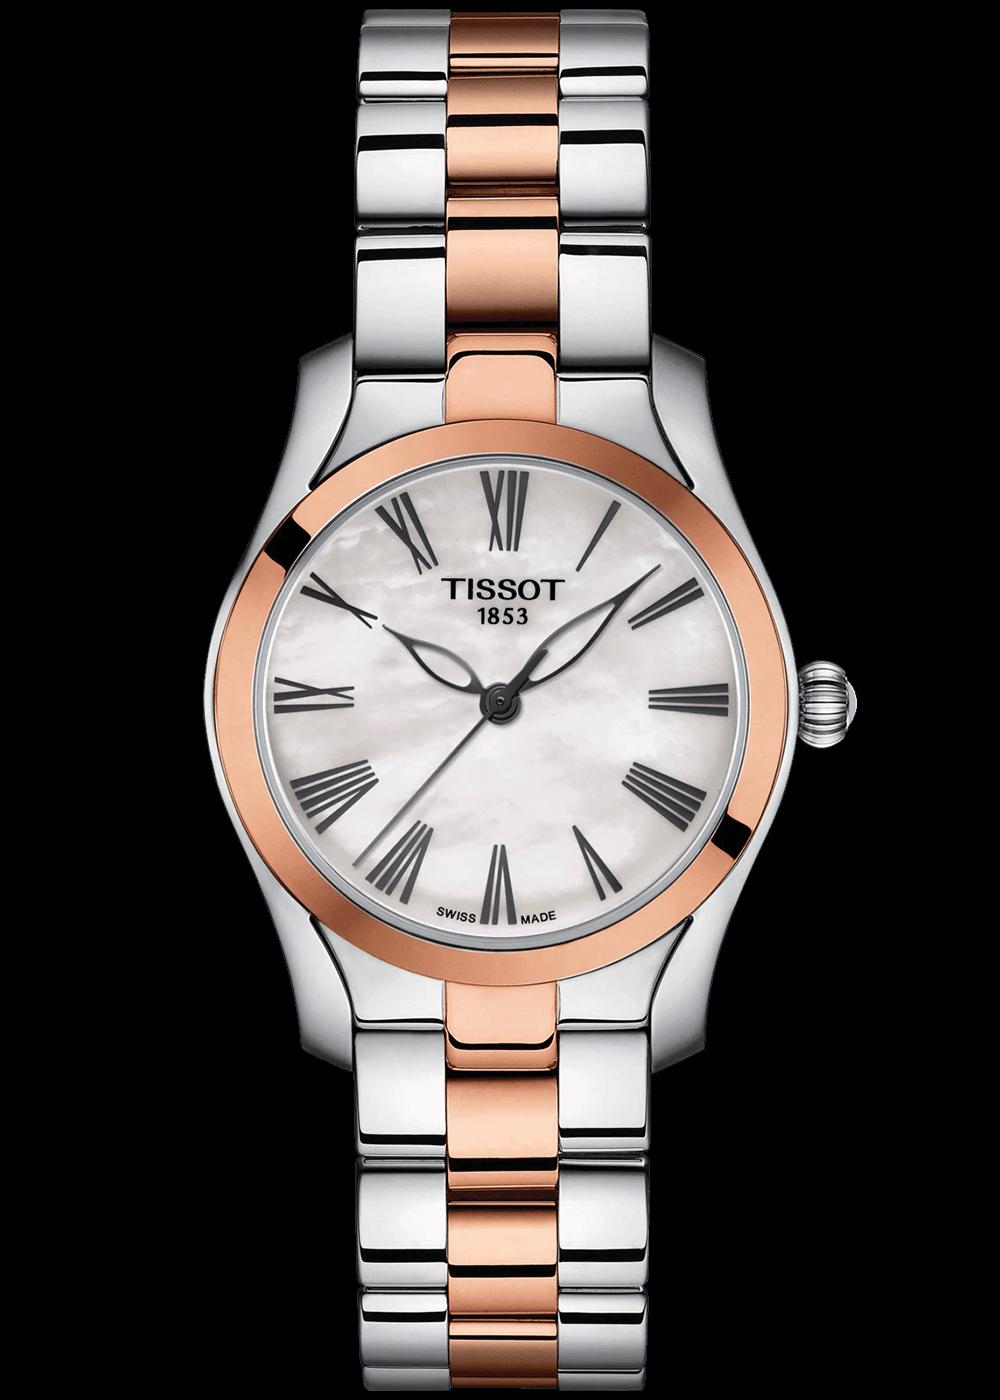 tissot-t-wave